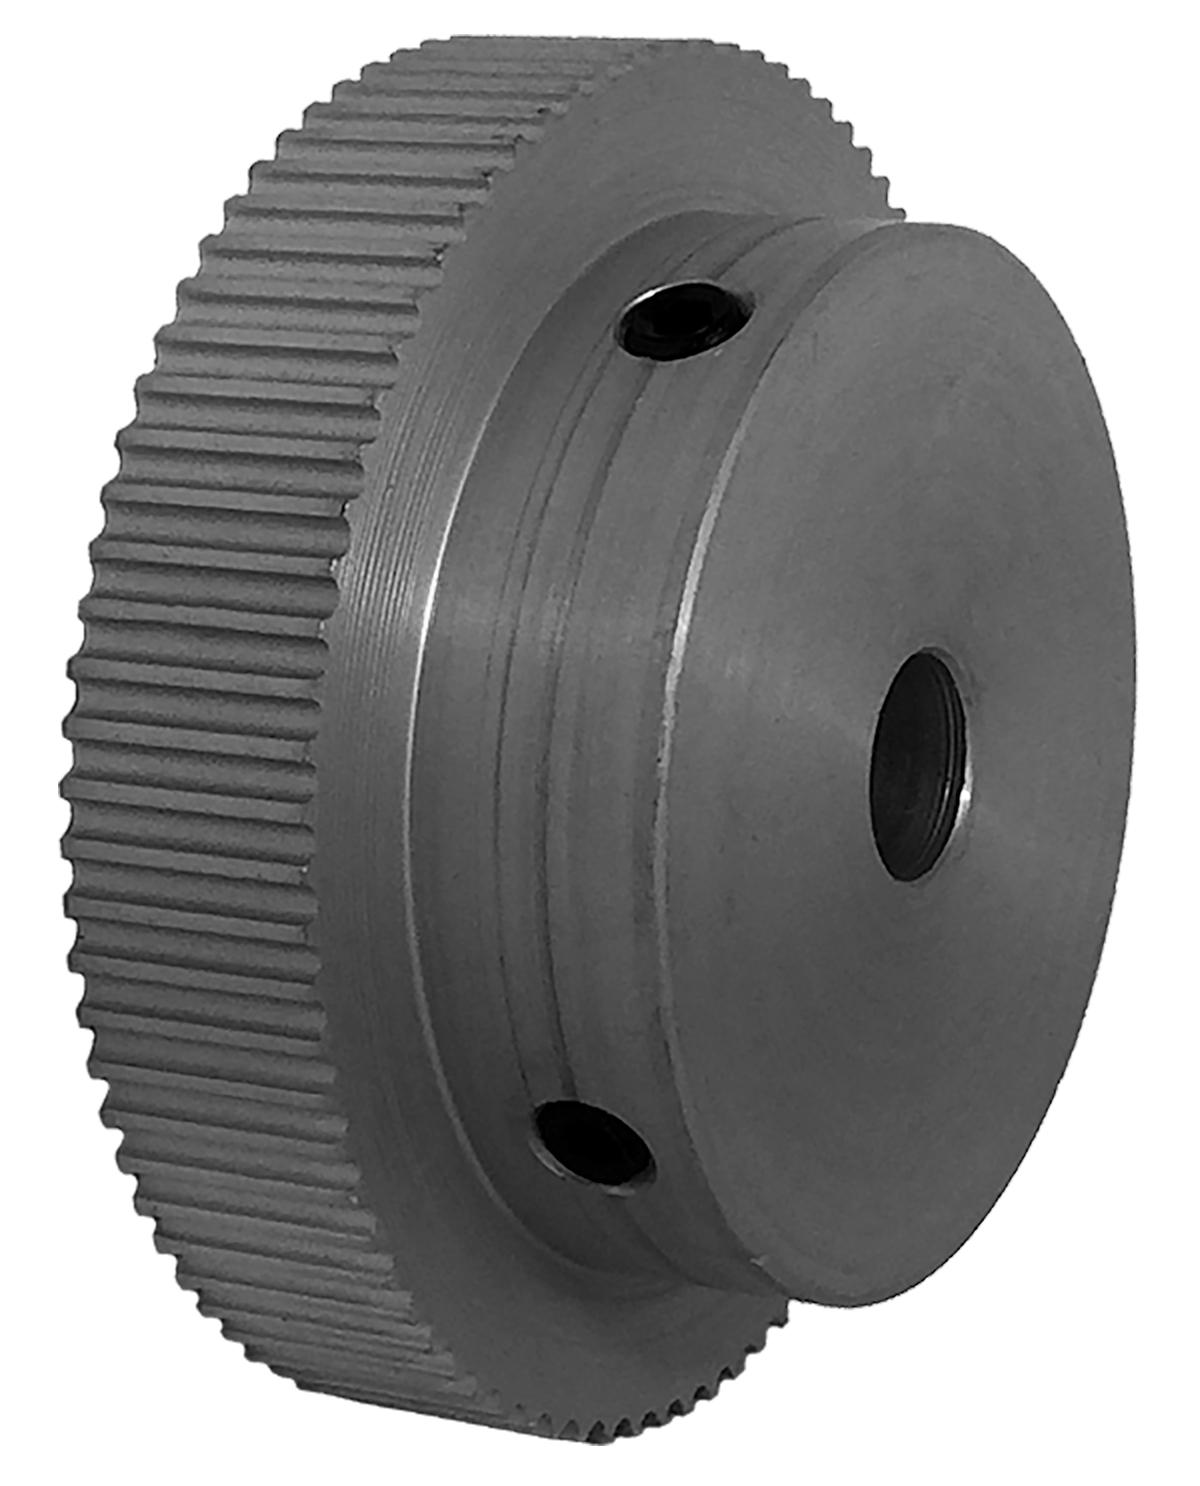 80-2P06-6A4 - Aluminum Powerhouse® Pulleys